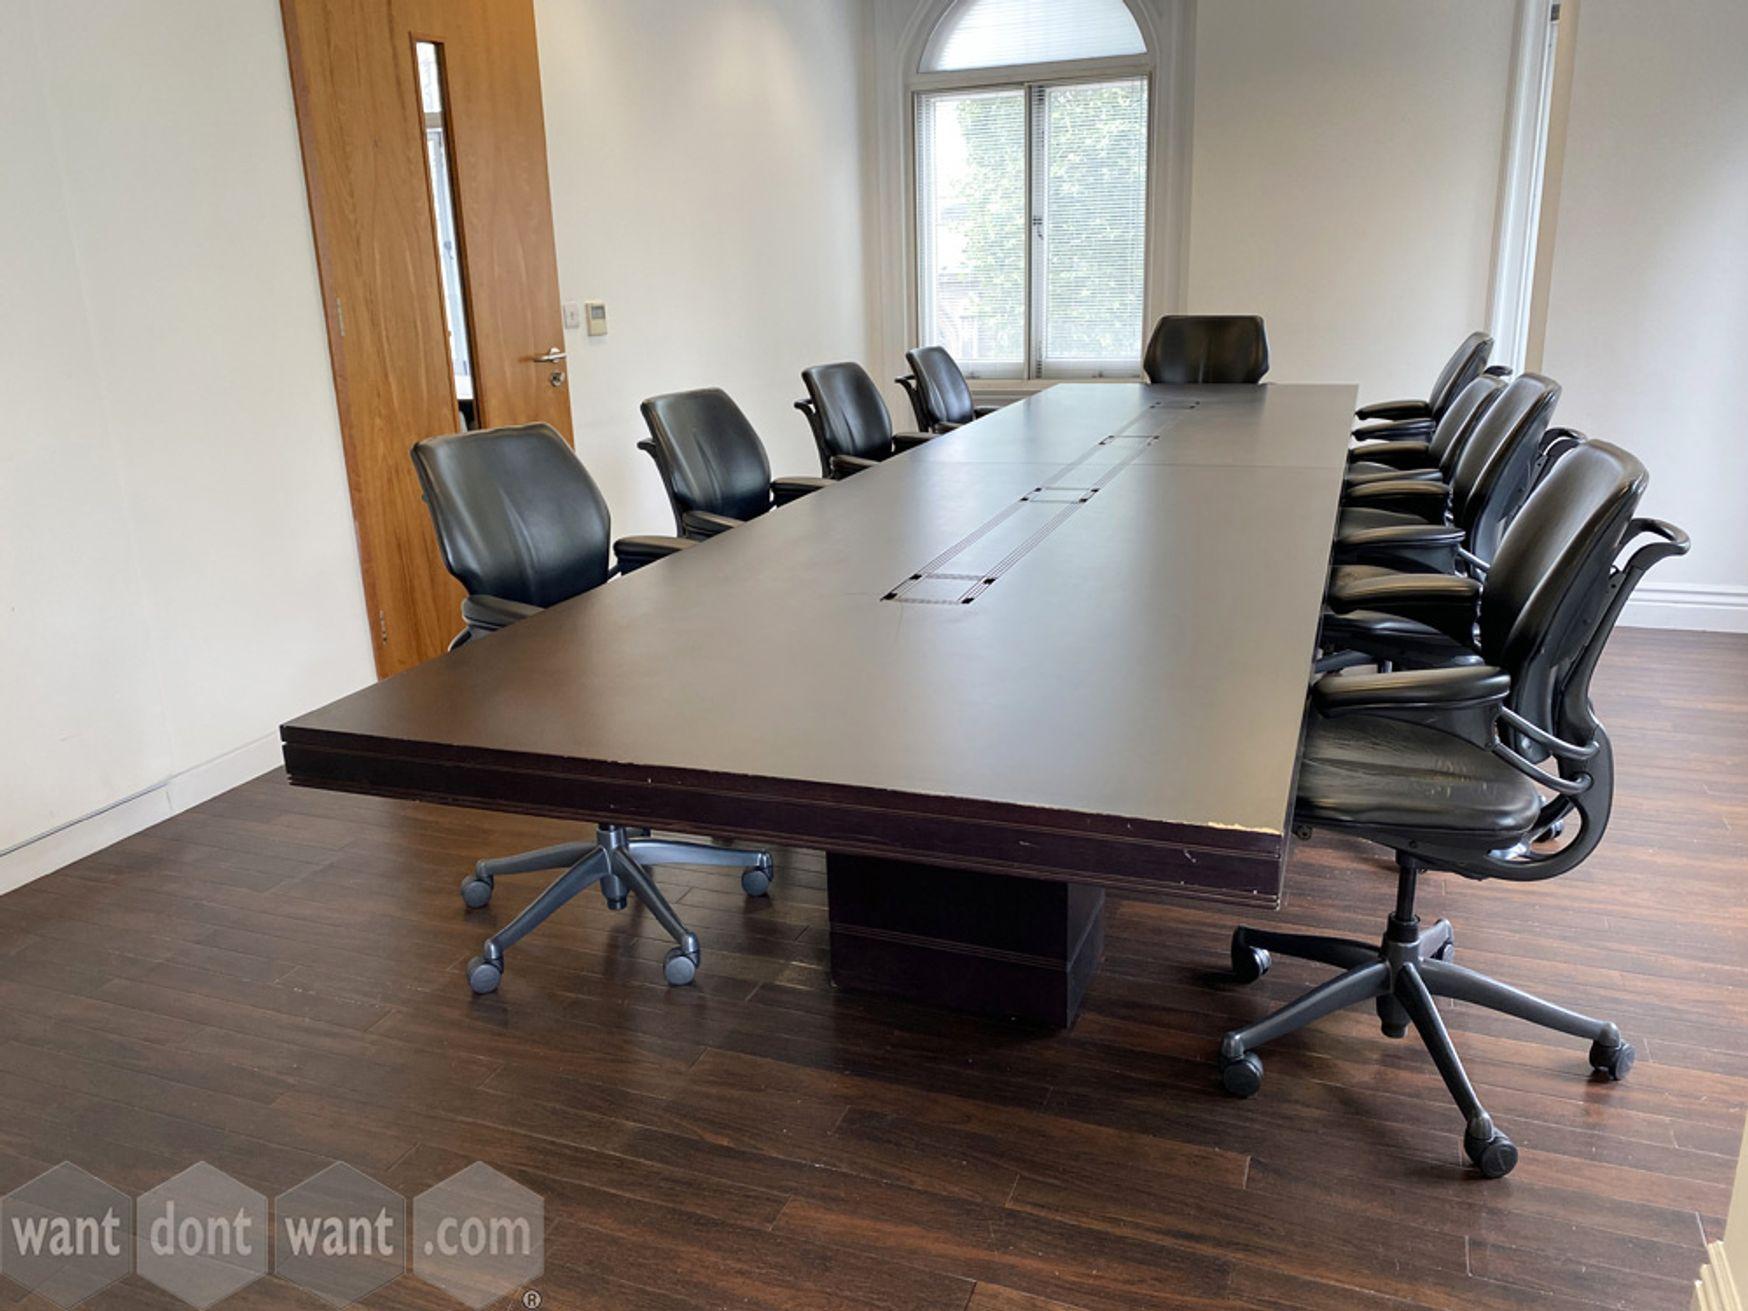 Used large boardroom table in dark mahogany veneer - some damage hence price